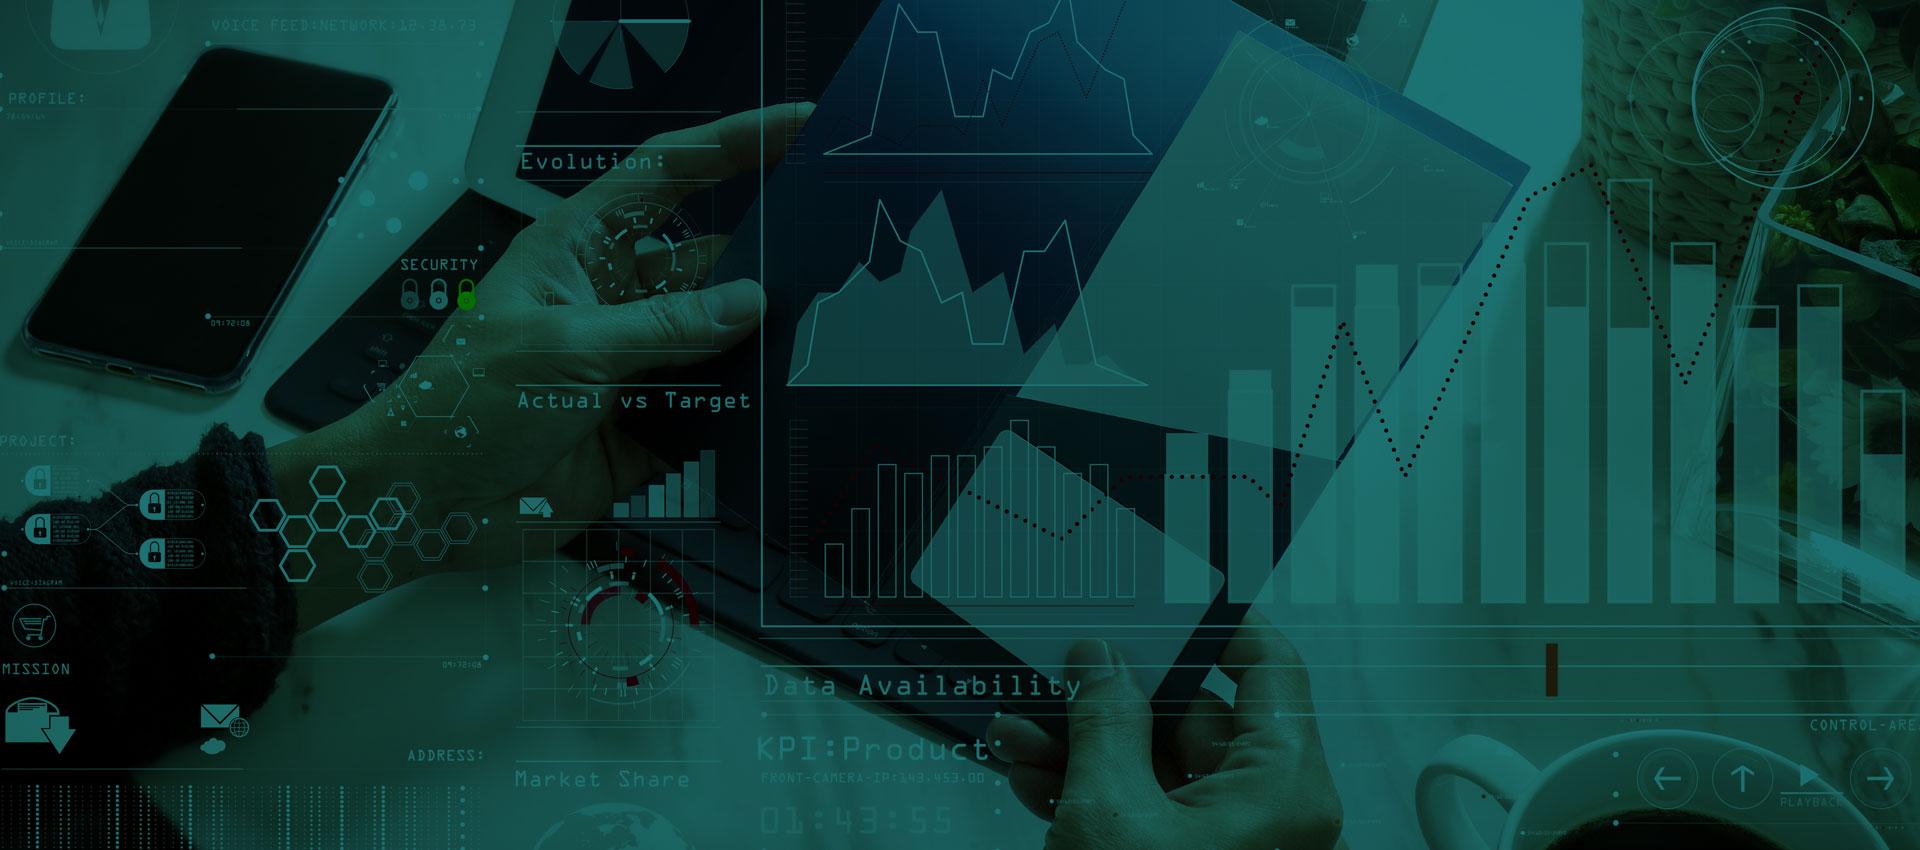 KPI Strategici gestione crediti